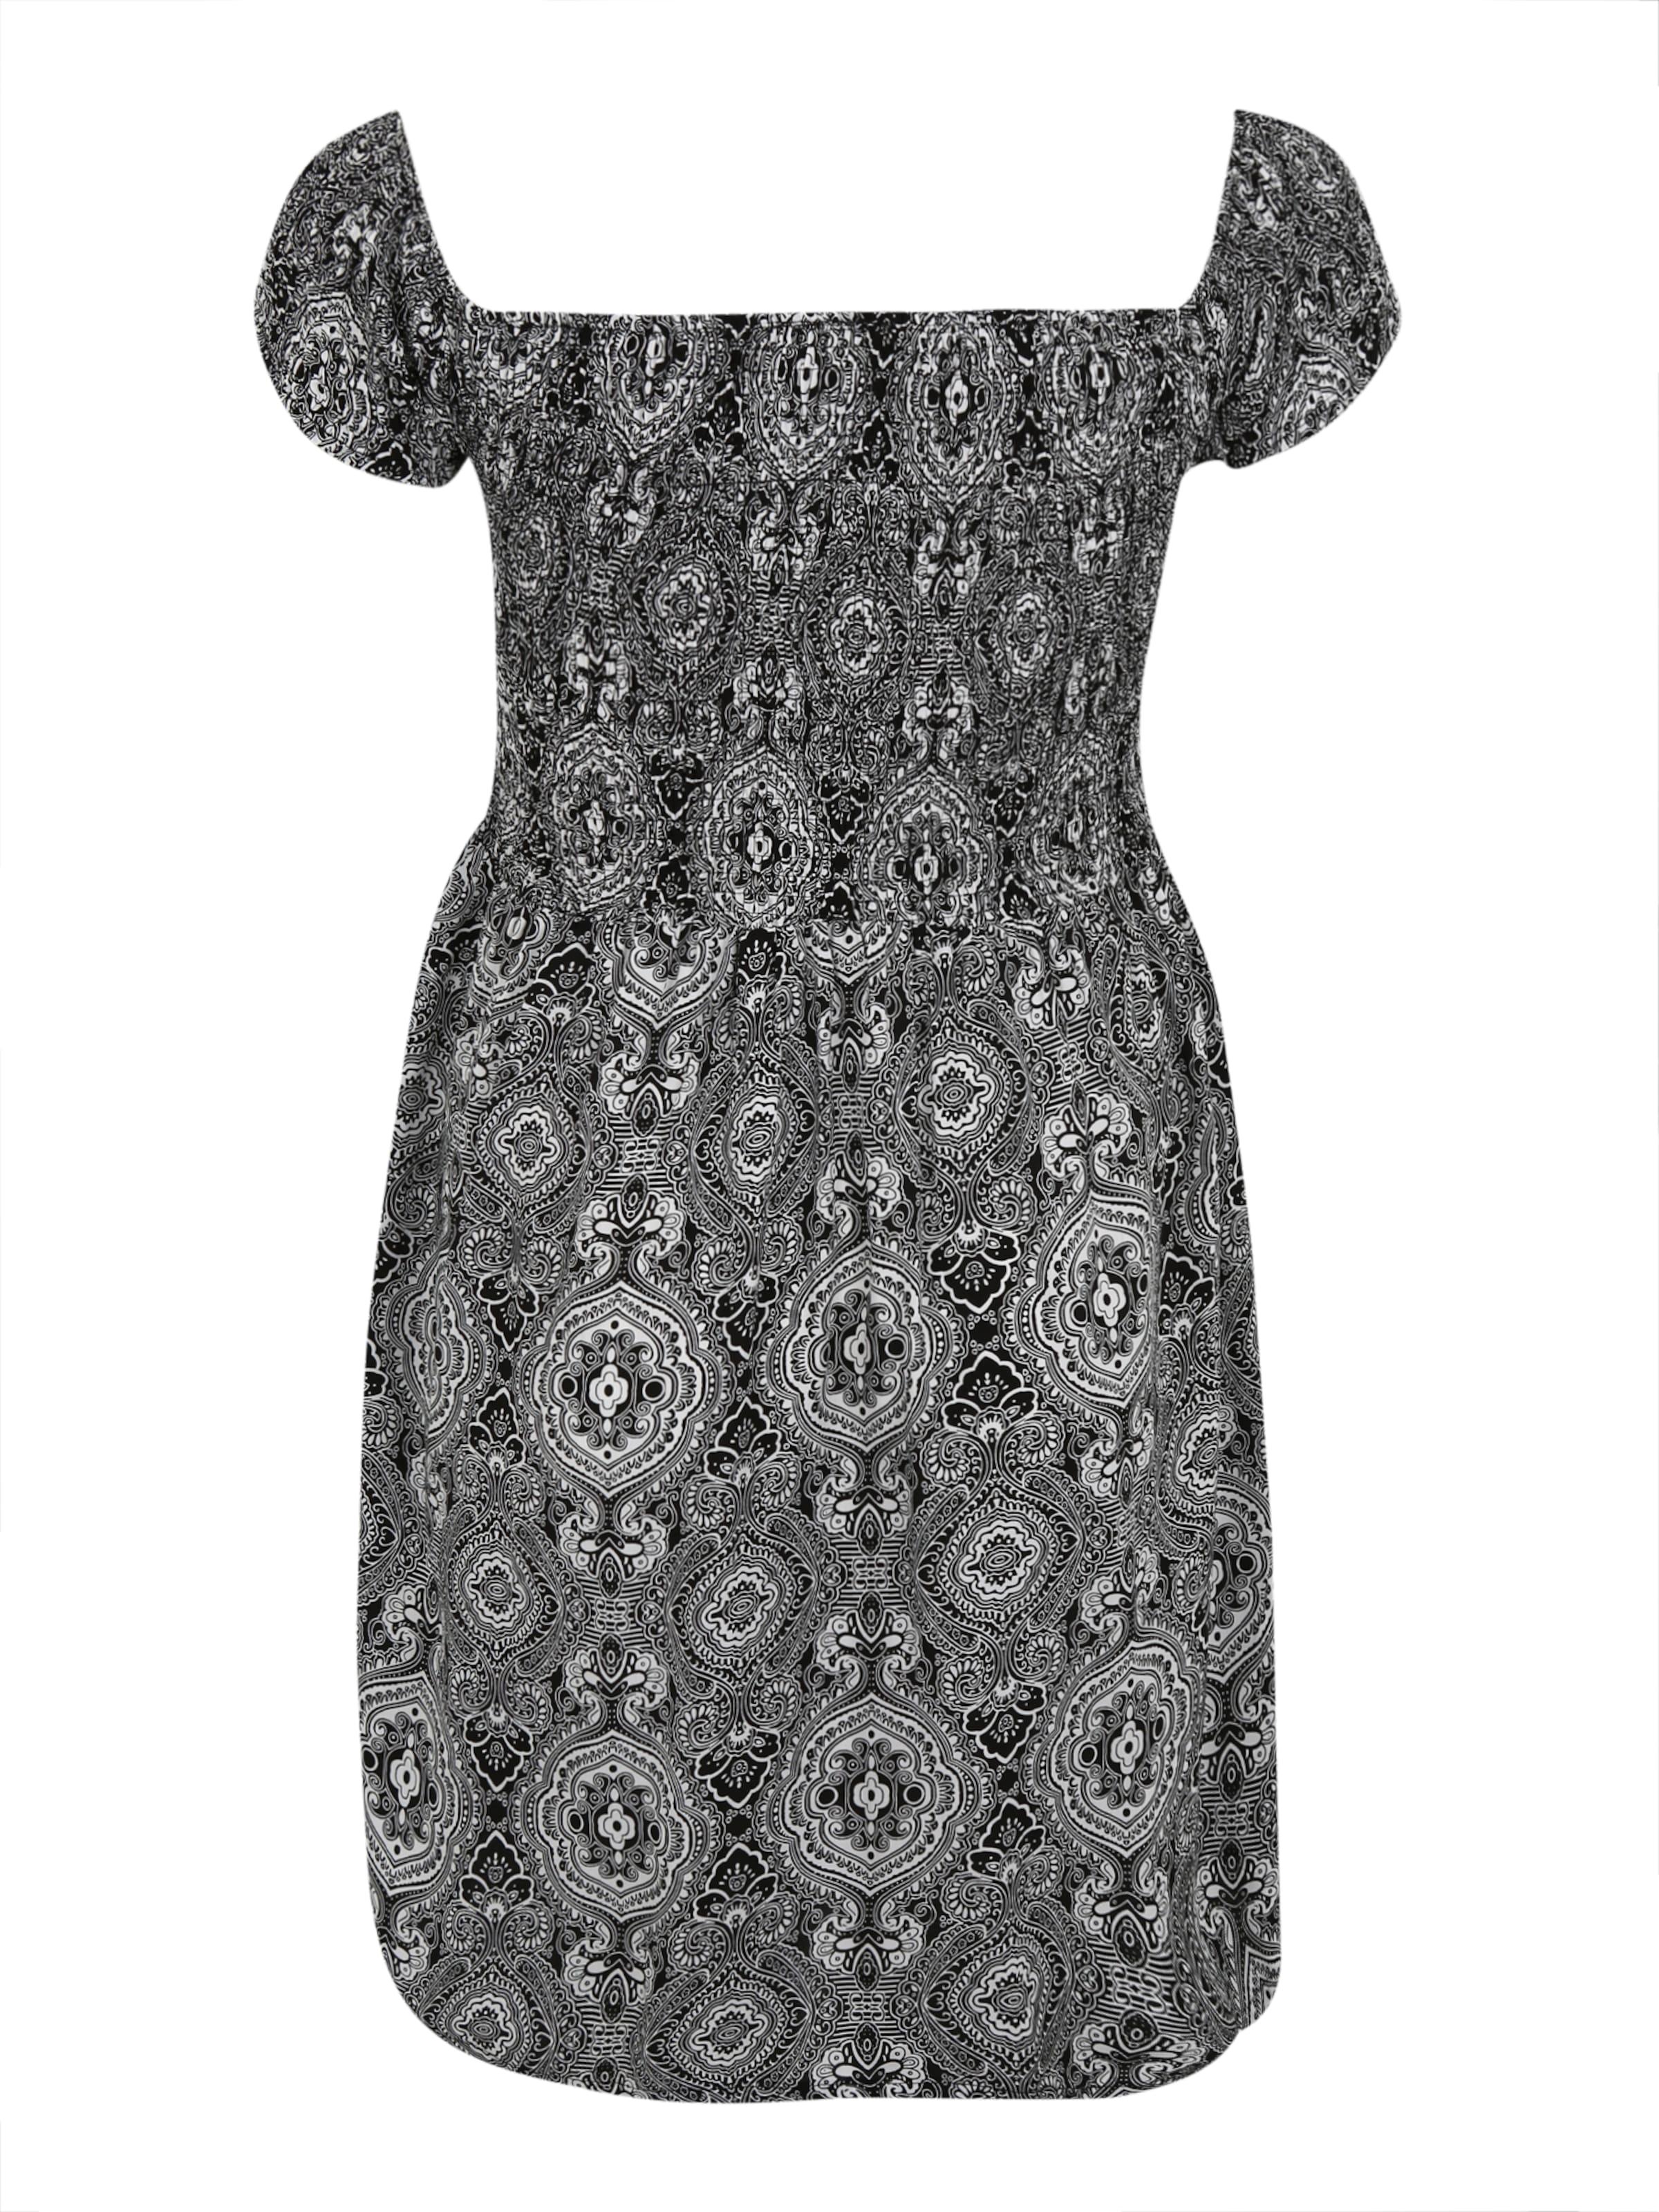 Curvy NoirBlanc Urban En Robe Classics 'smoked' fI7gybY6v